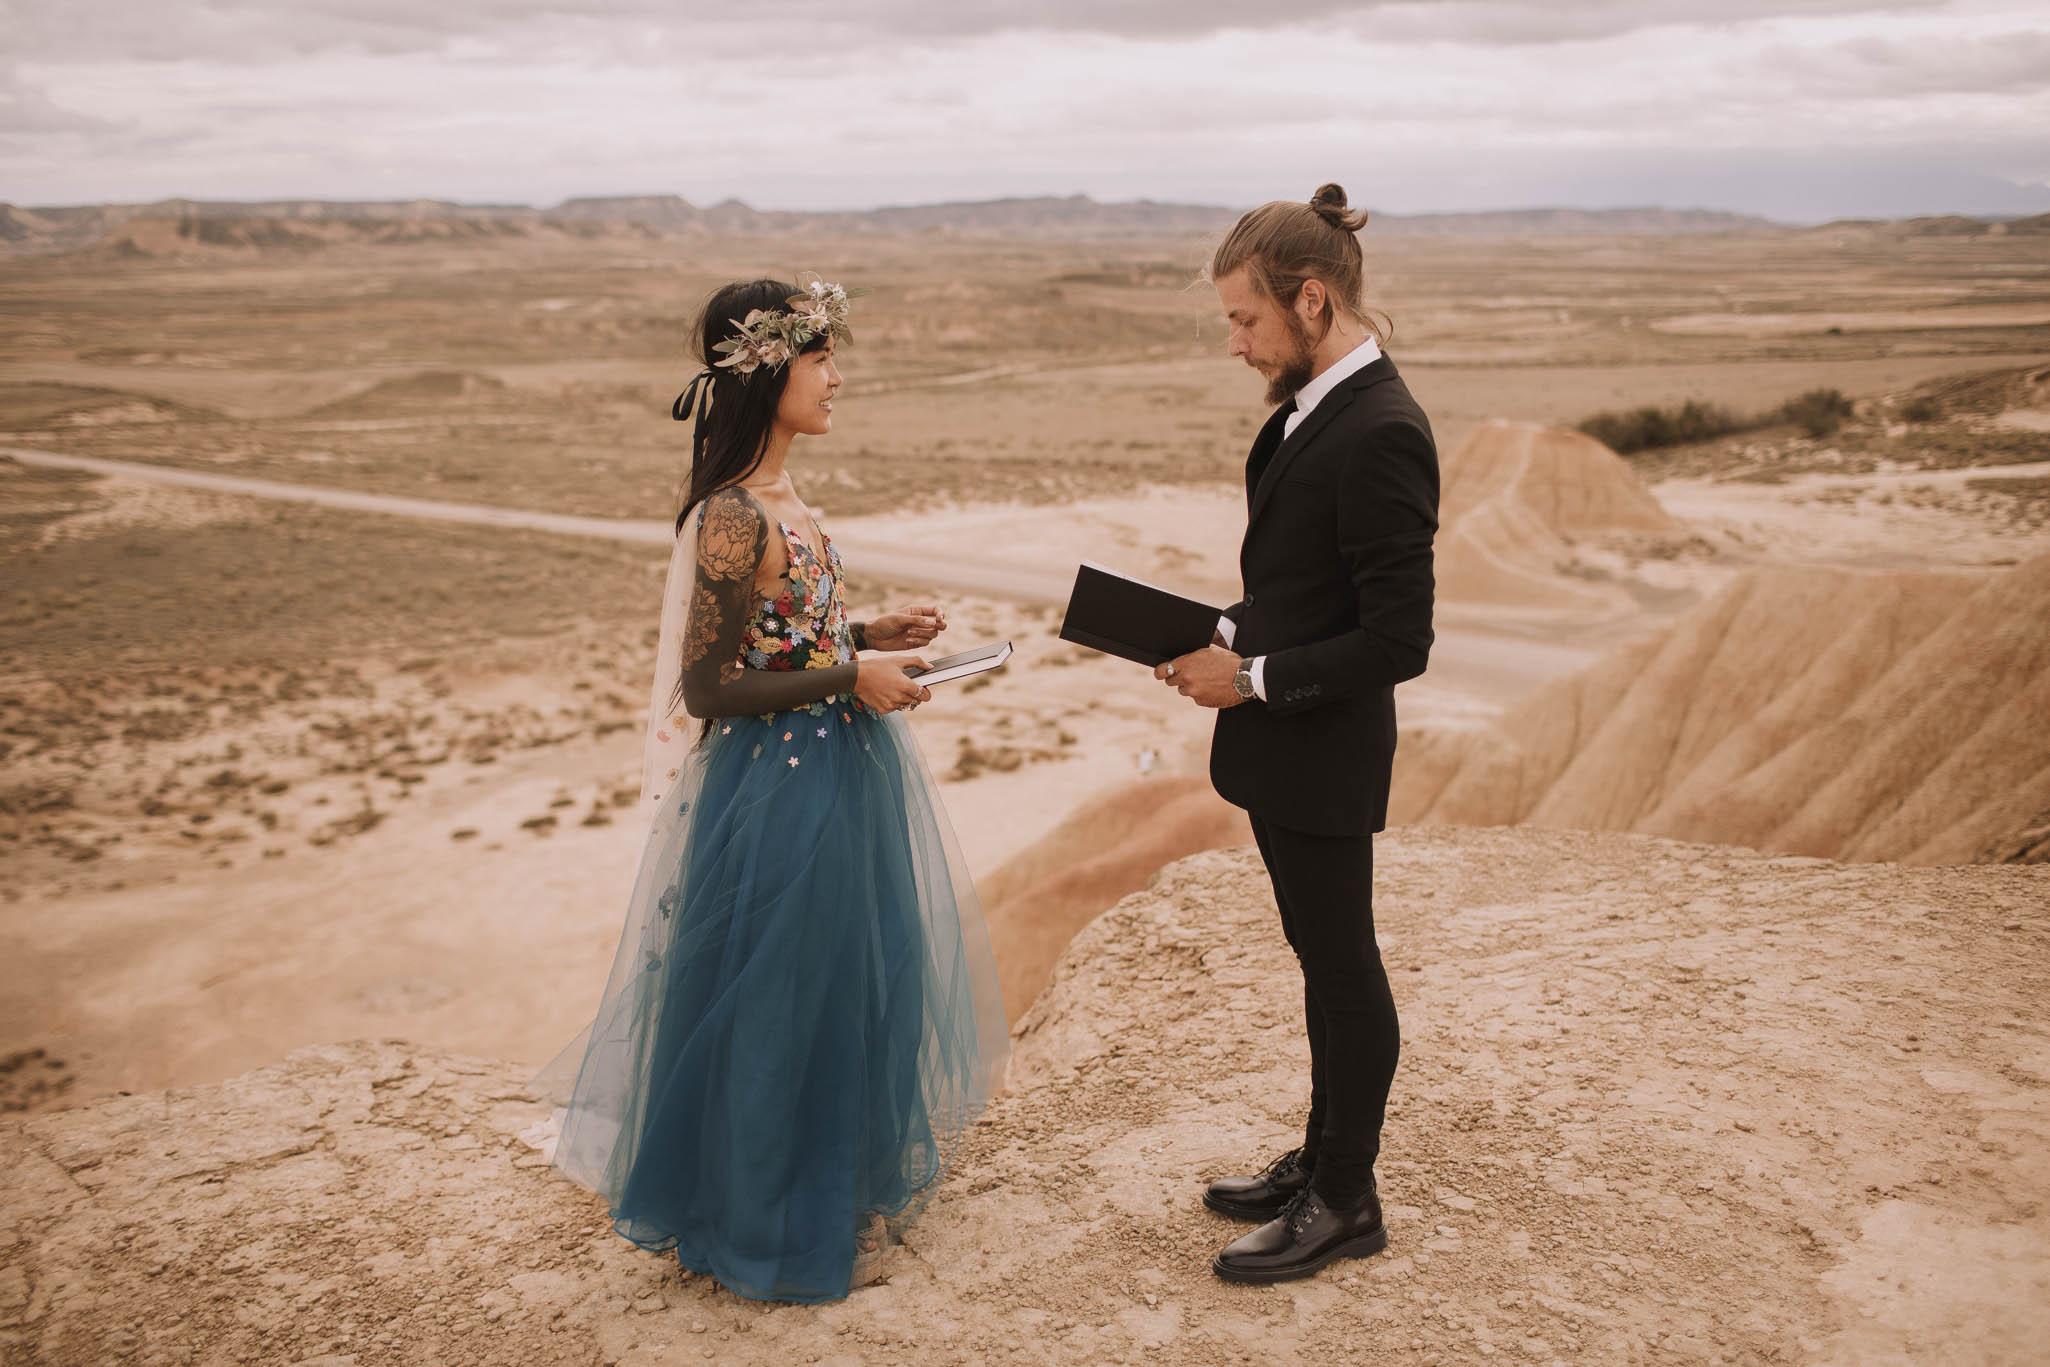 Spain-wedding-photographer-bardenas-reales-jeremy-boyer-photographe-mariage-bordeaux-floral-wedding-dress-robe-91.jpg